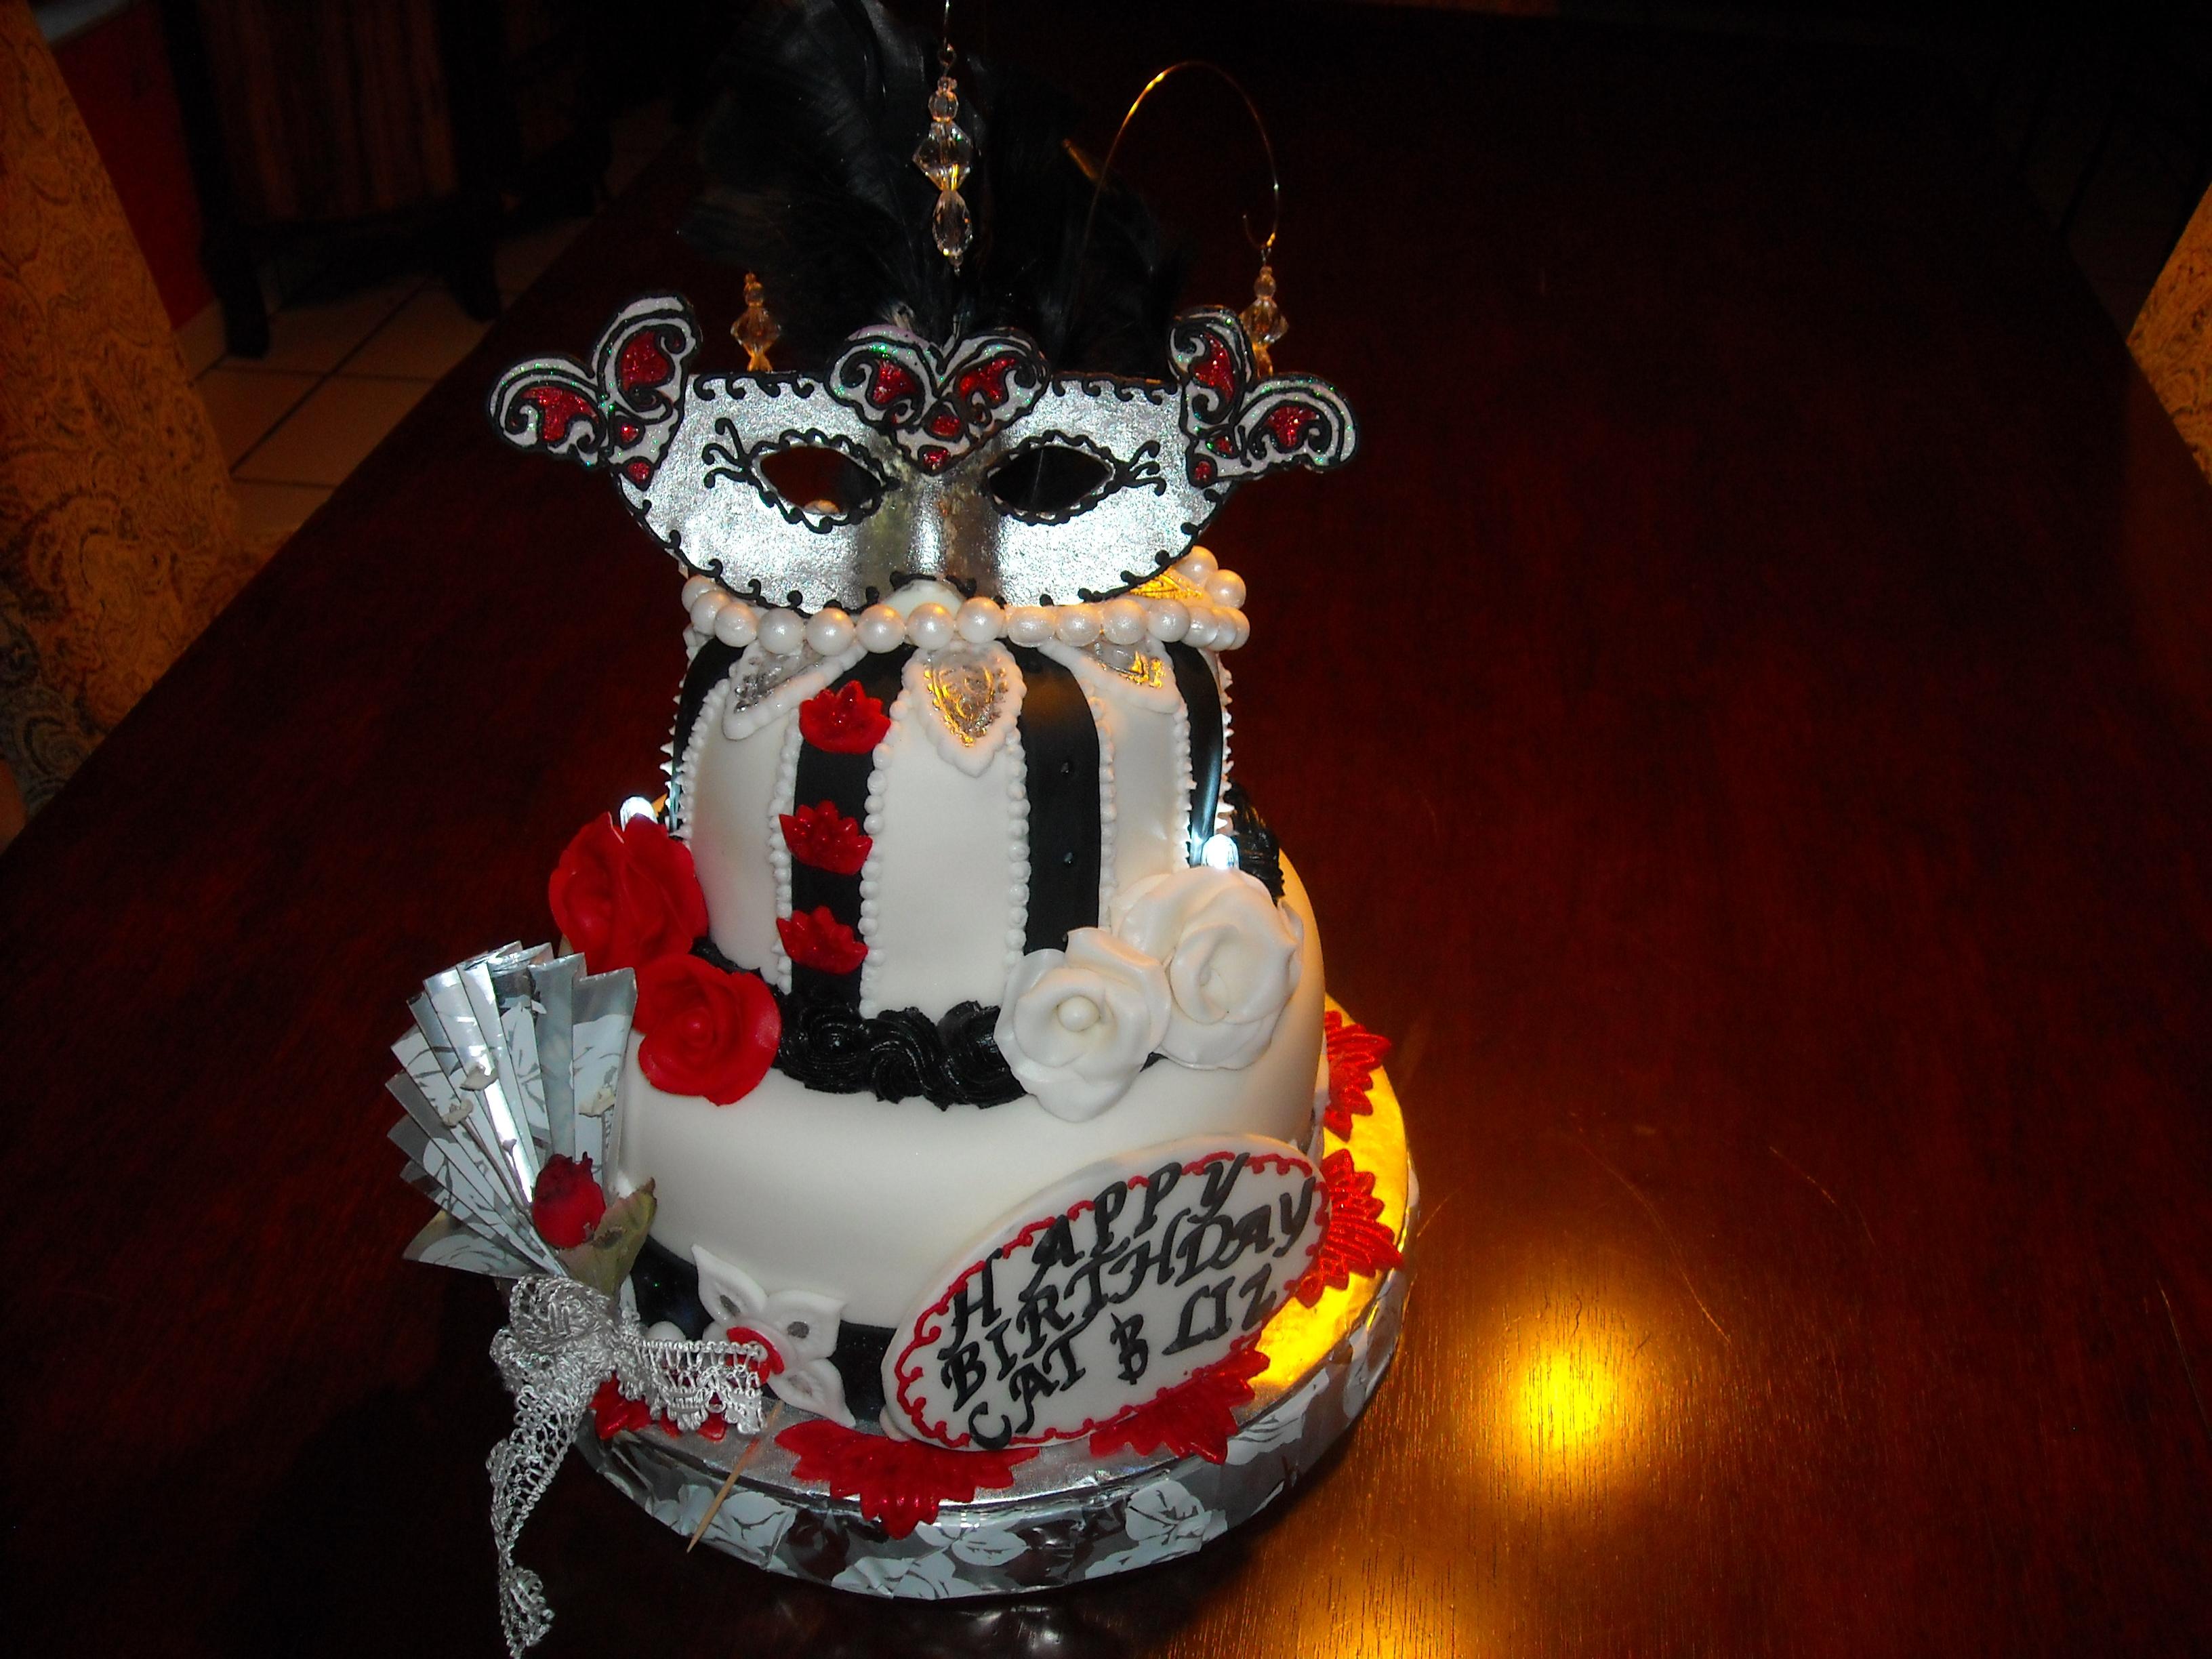 Awe Inspiring 7 Mask For Birthday Cakes Photo Masquerade Mask Birthday Cake Funny Birthday Cards Online Alyptdamsfinfo